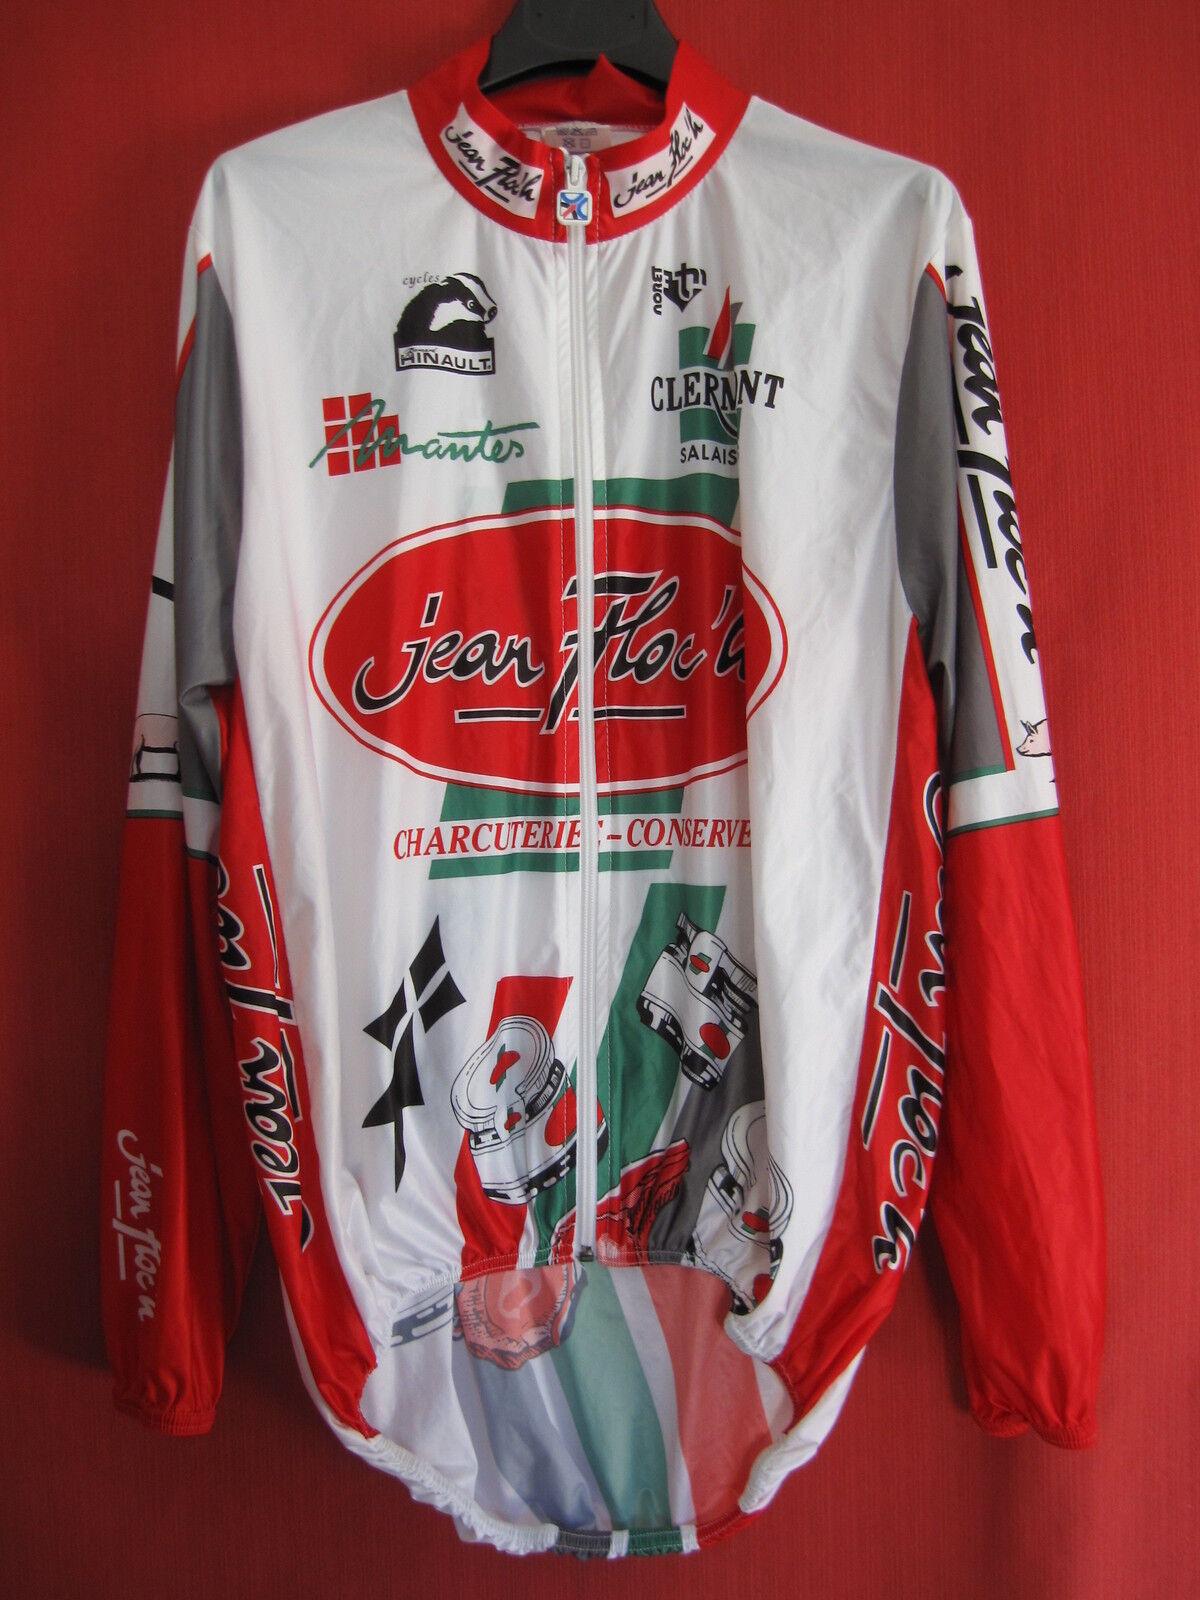 Maillot cycliste Coupe Vent Equipe pro Jean Floc'h Mantes Bernard Hinault 2   S